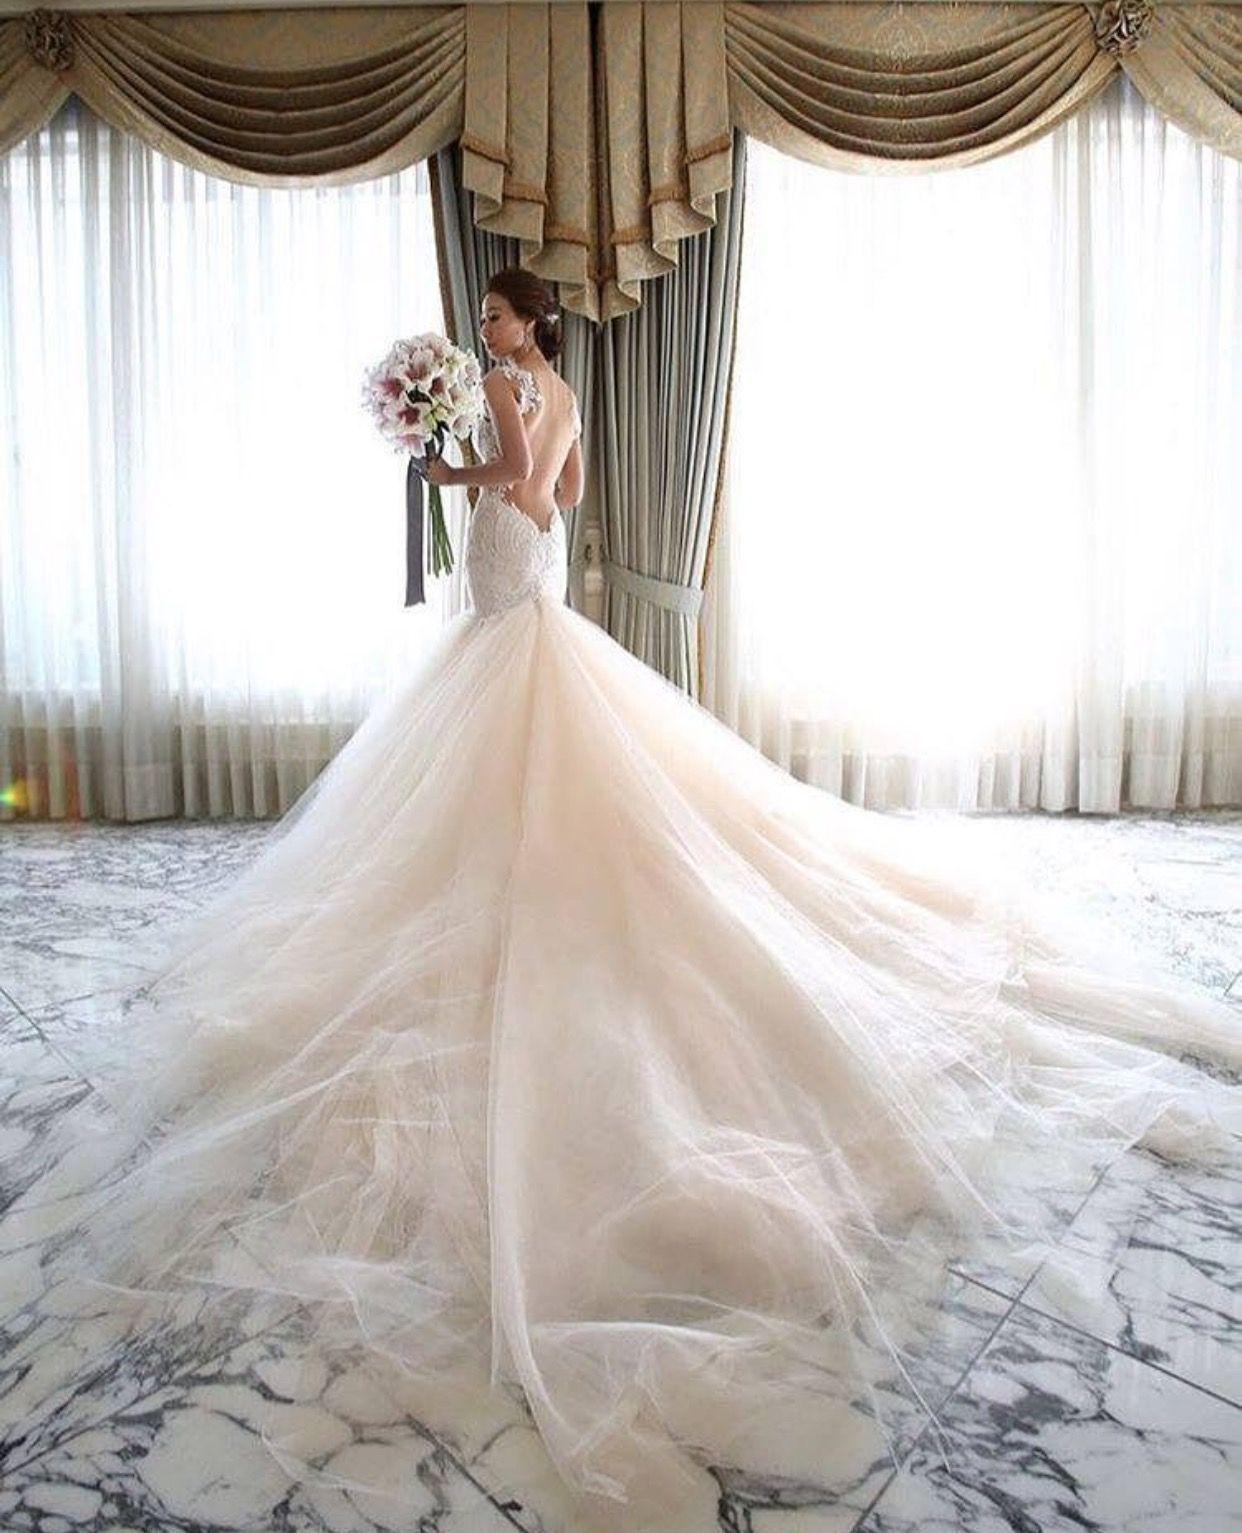 Pin by emeliene sathanantham on wedding ceremony dress ideas